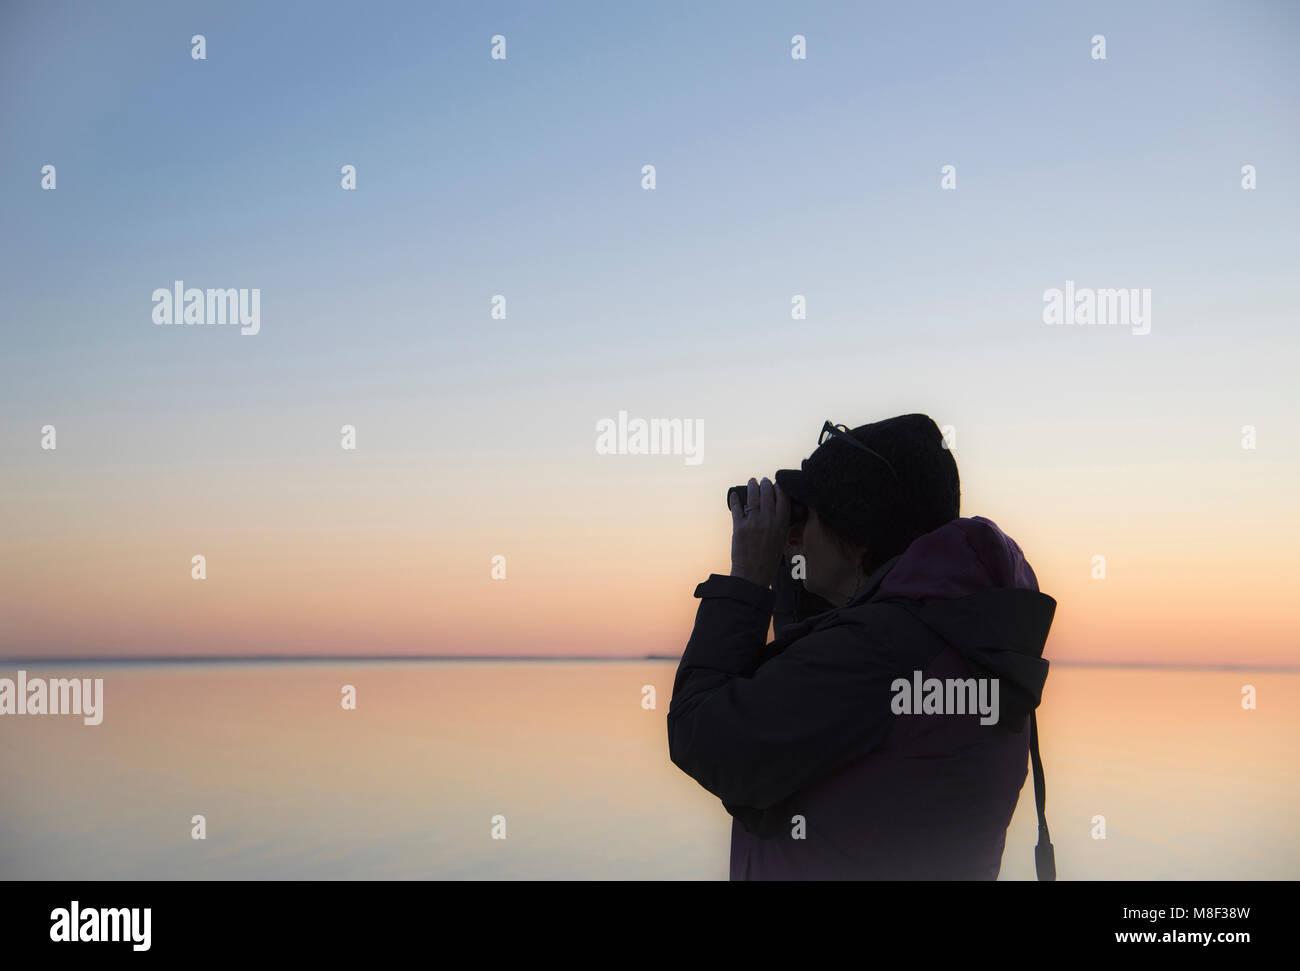 Senior woman birdwatching at sunset - Stock Image